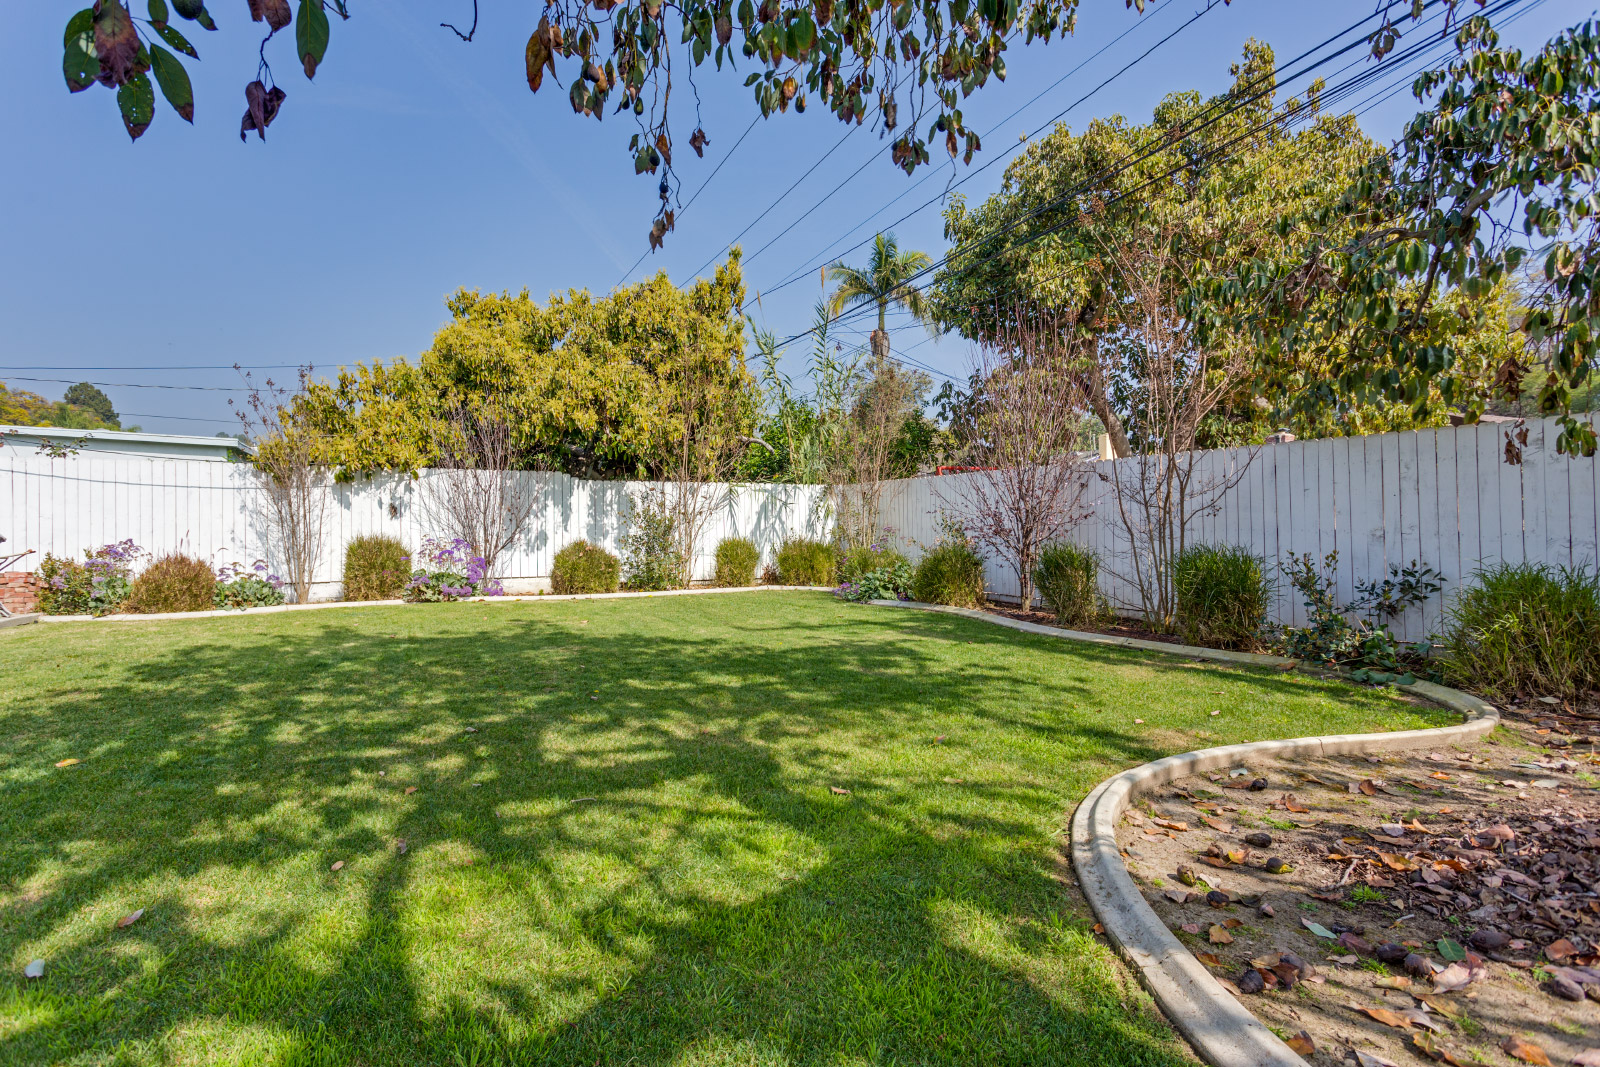 backyard-grass_16580733728_o.jpg